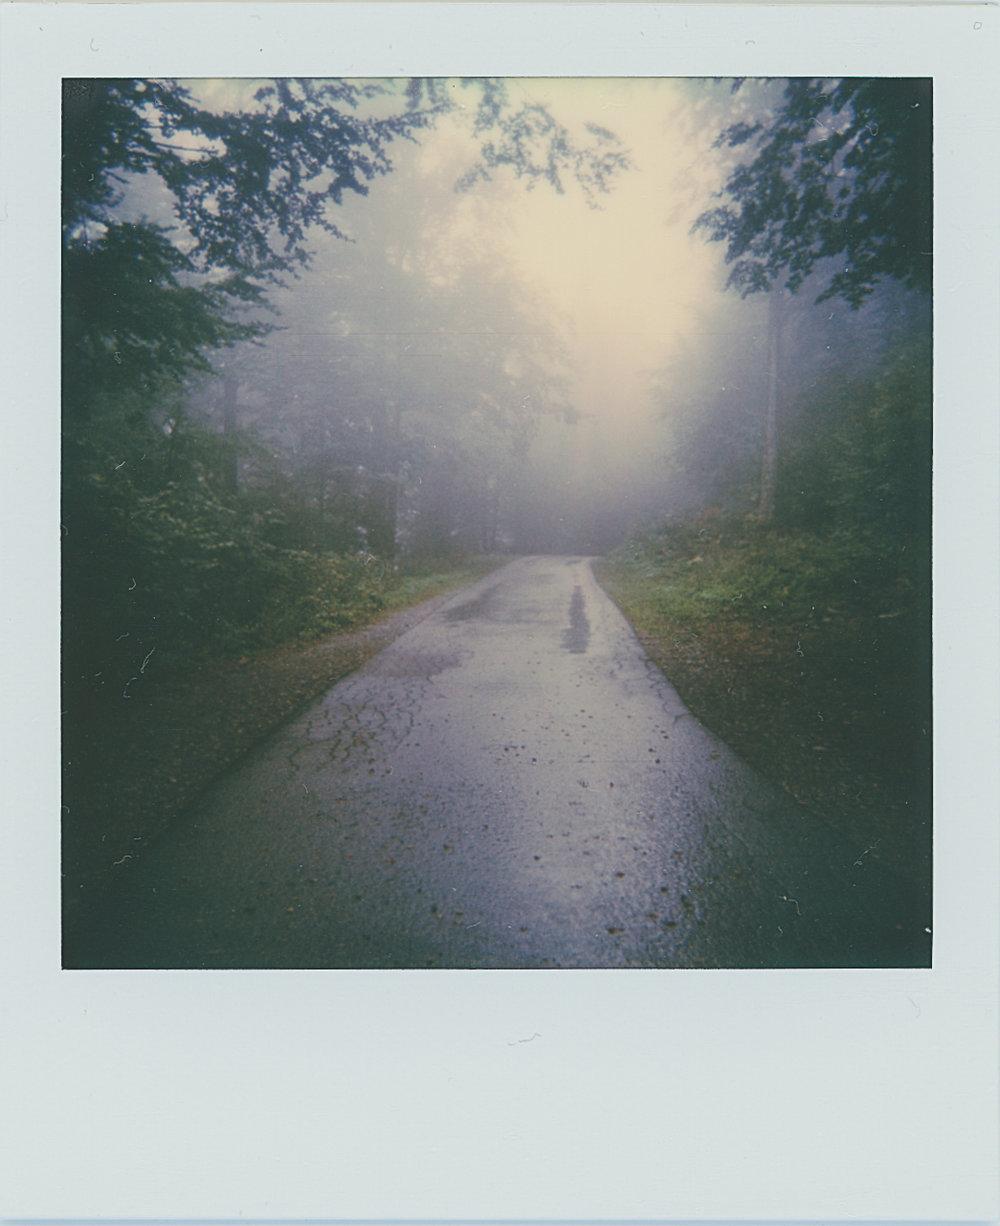 Foggy Road | Polaroid 600 | Josip Sore